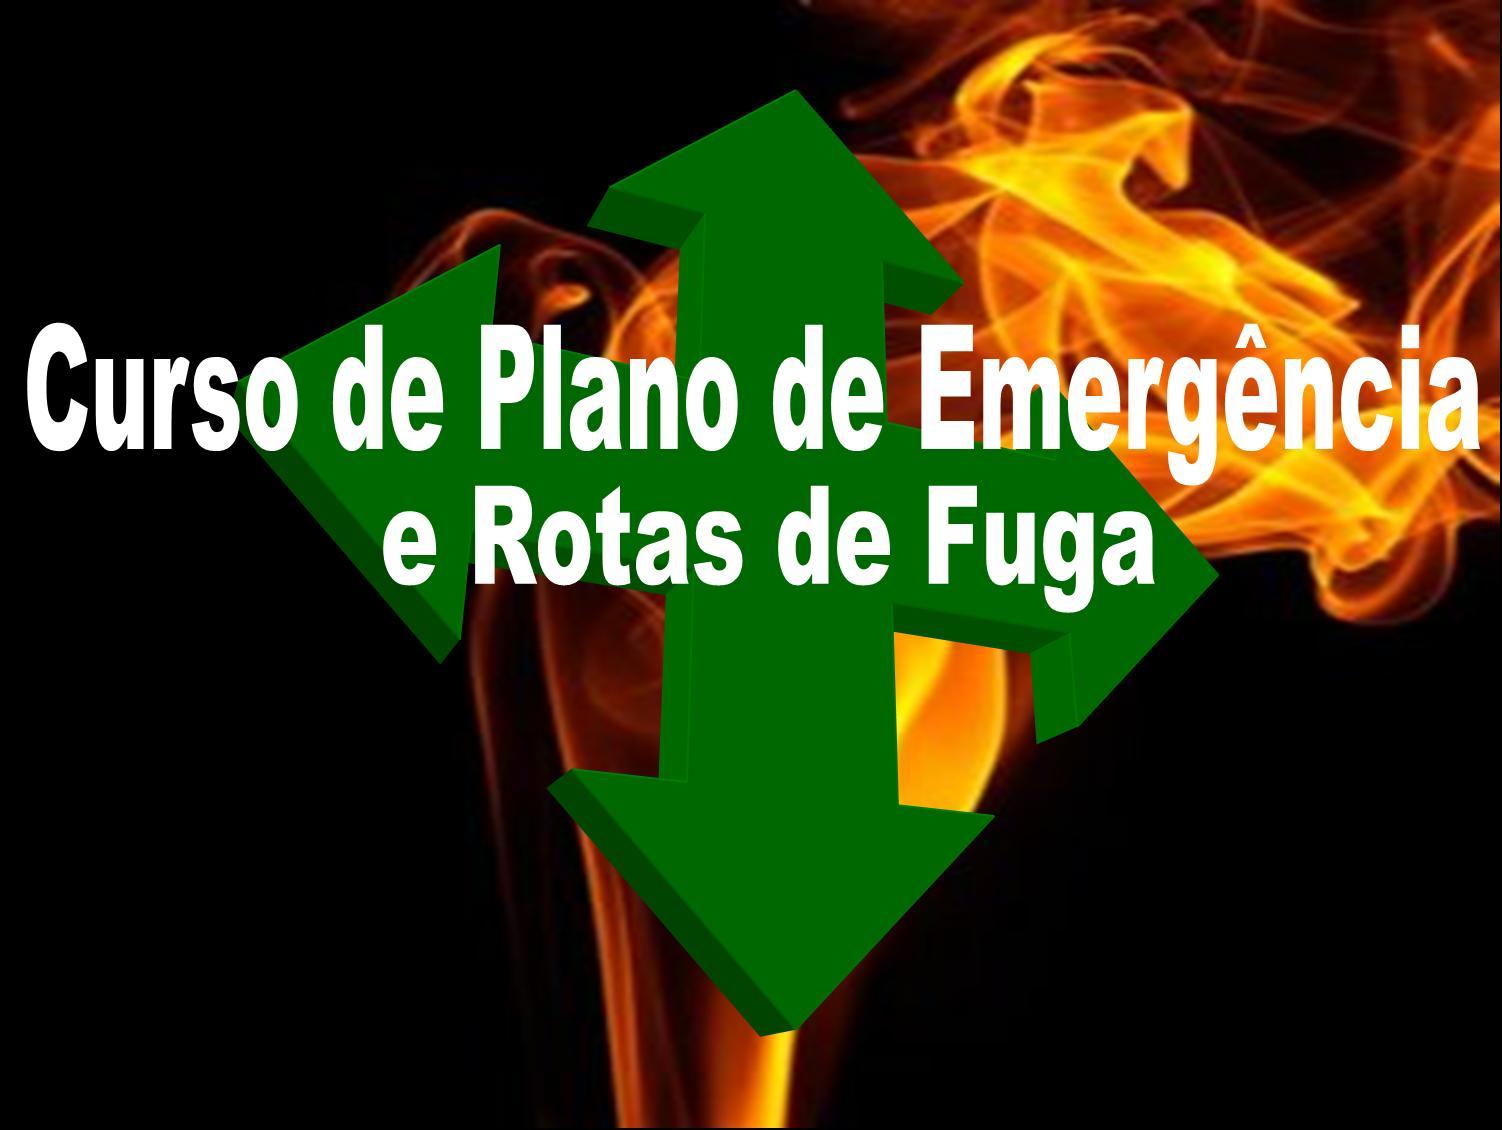 emergencia contra incendio: